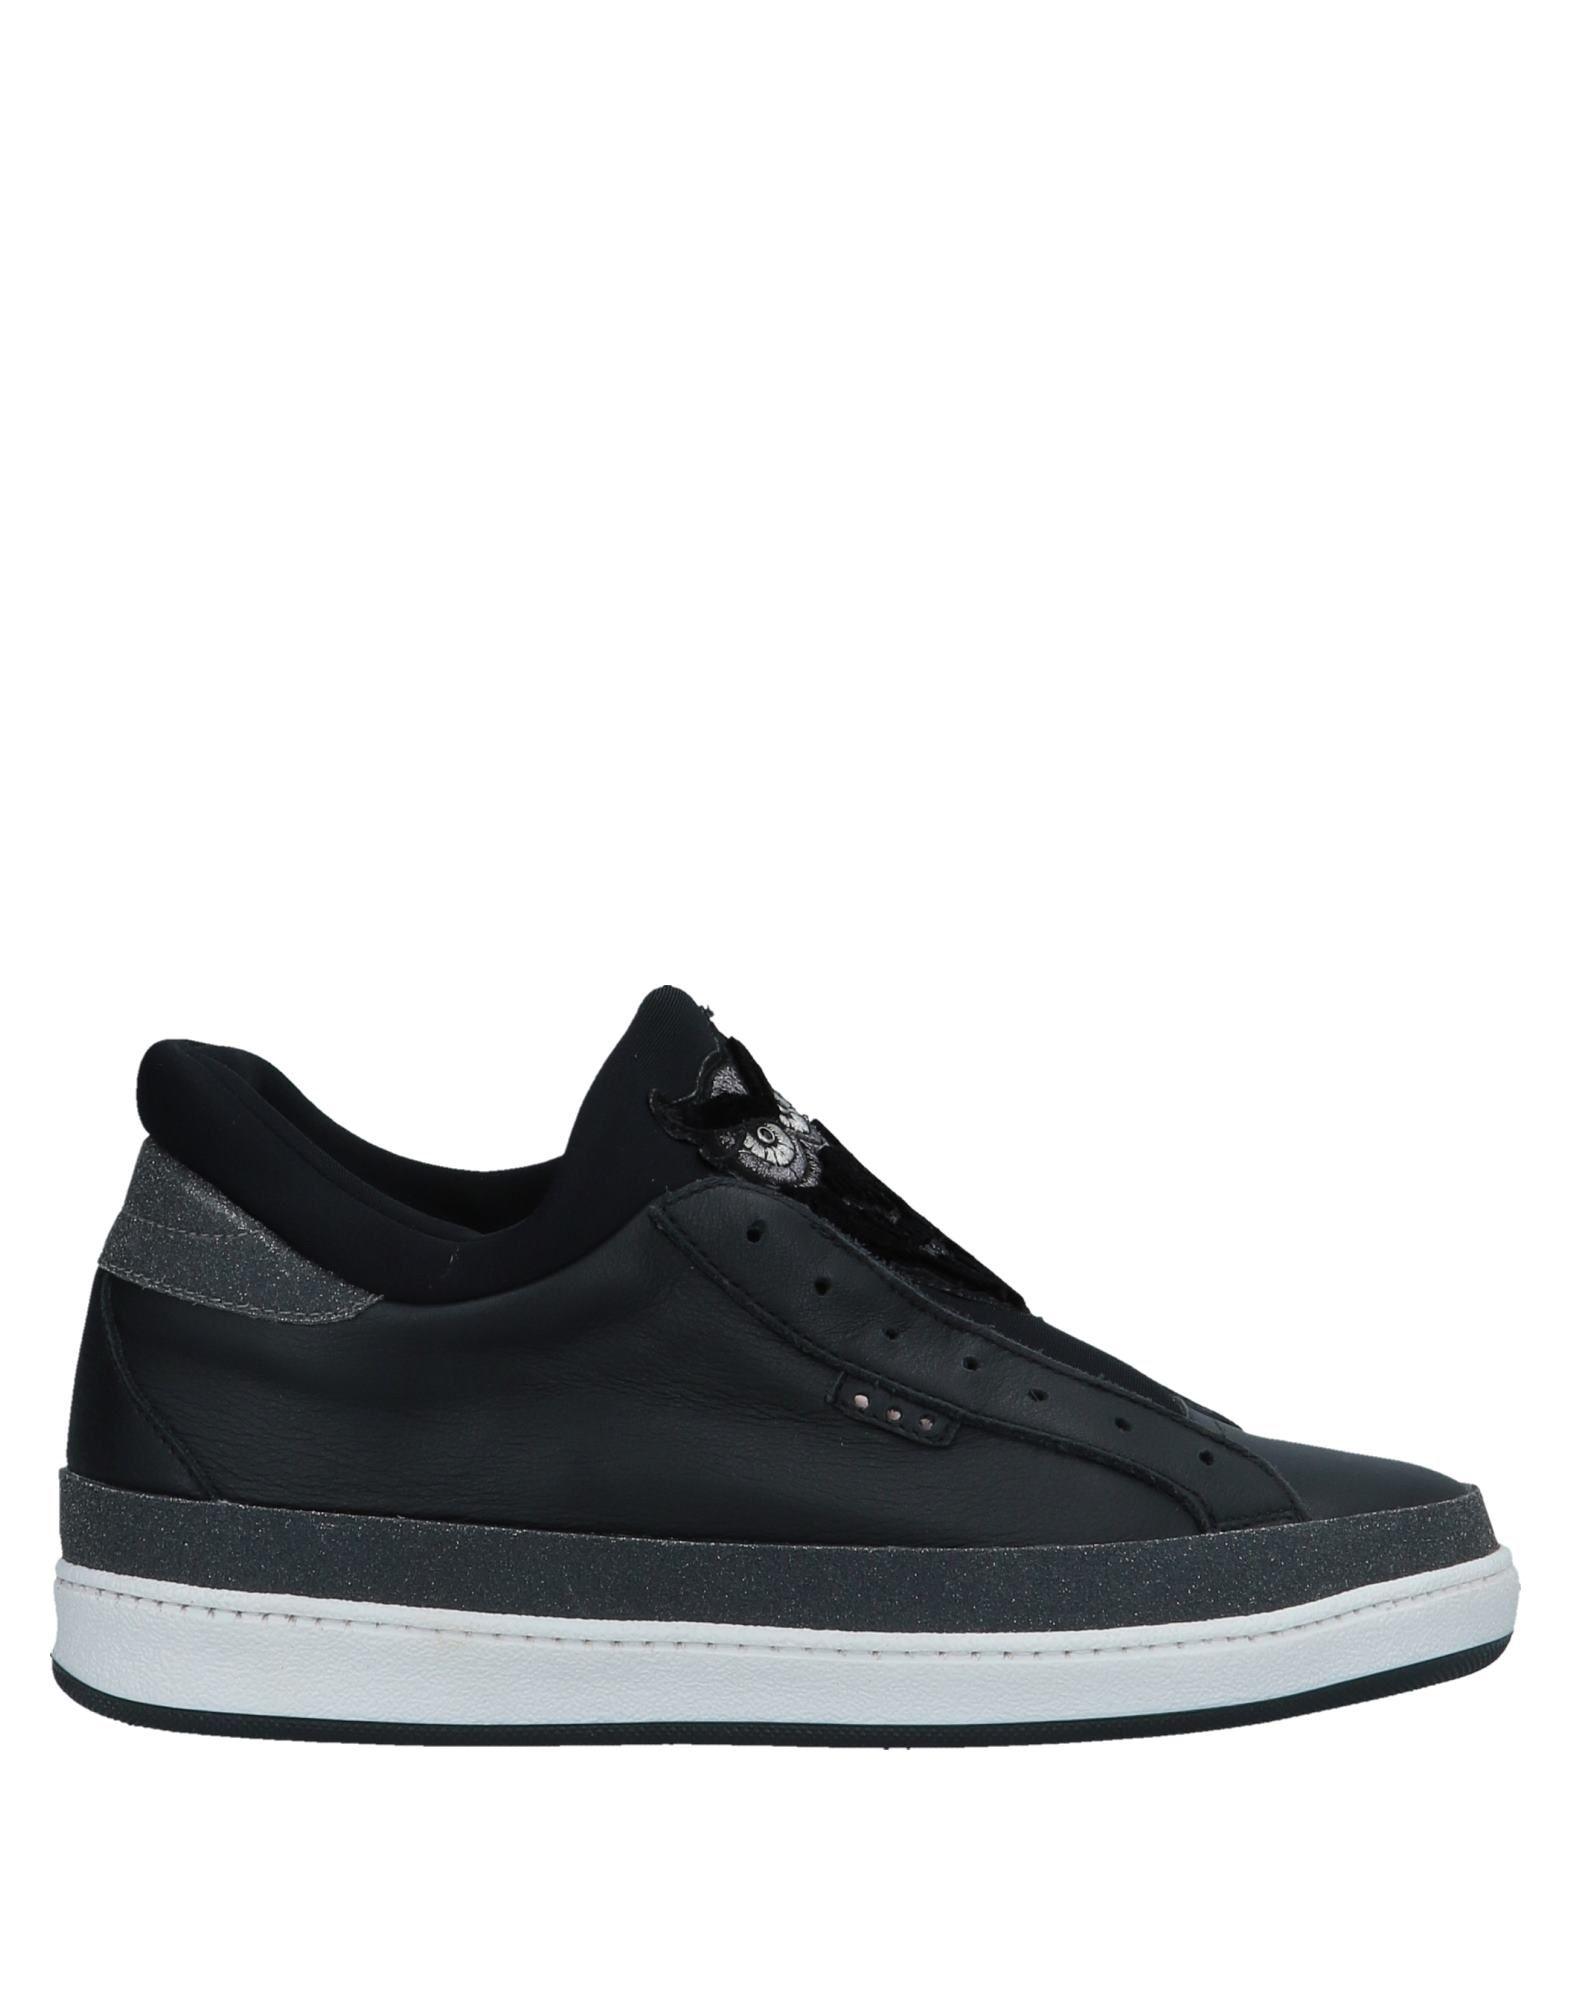 Quattrobarradodici Sneakers online - Women Quattrobarradodici Sneakers online Sneakers on  Australia - 11573670BG e74d60